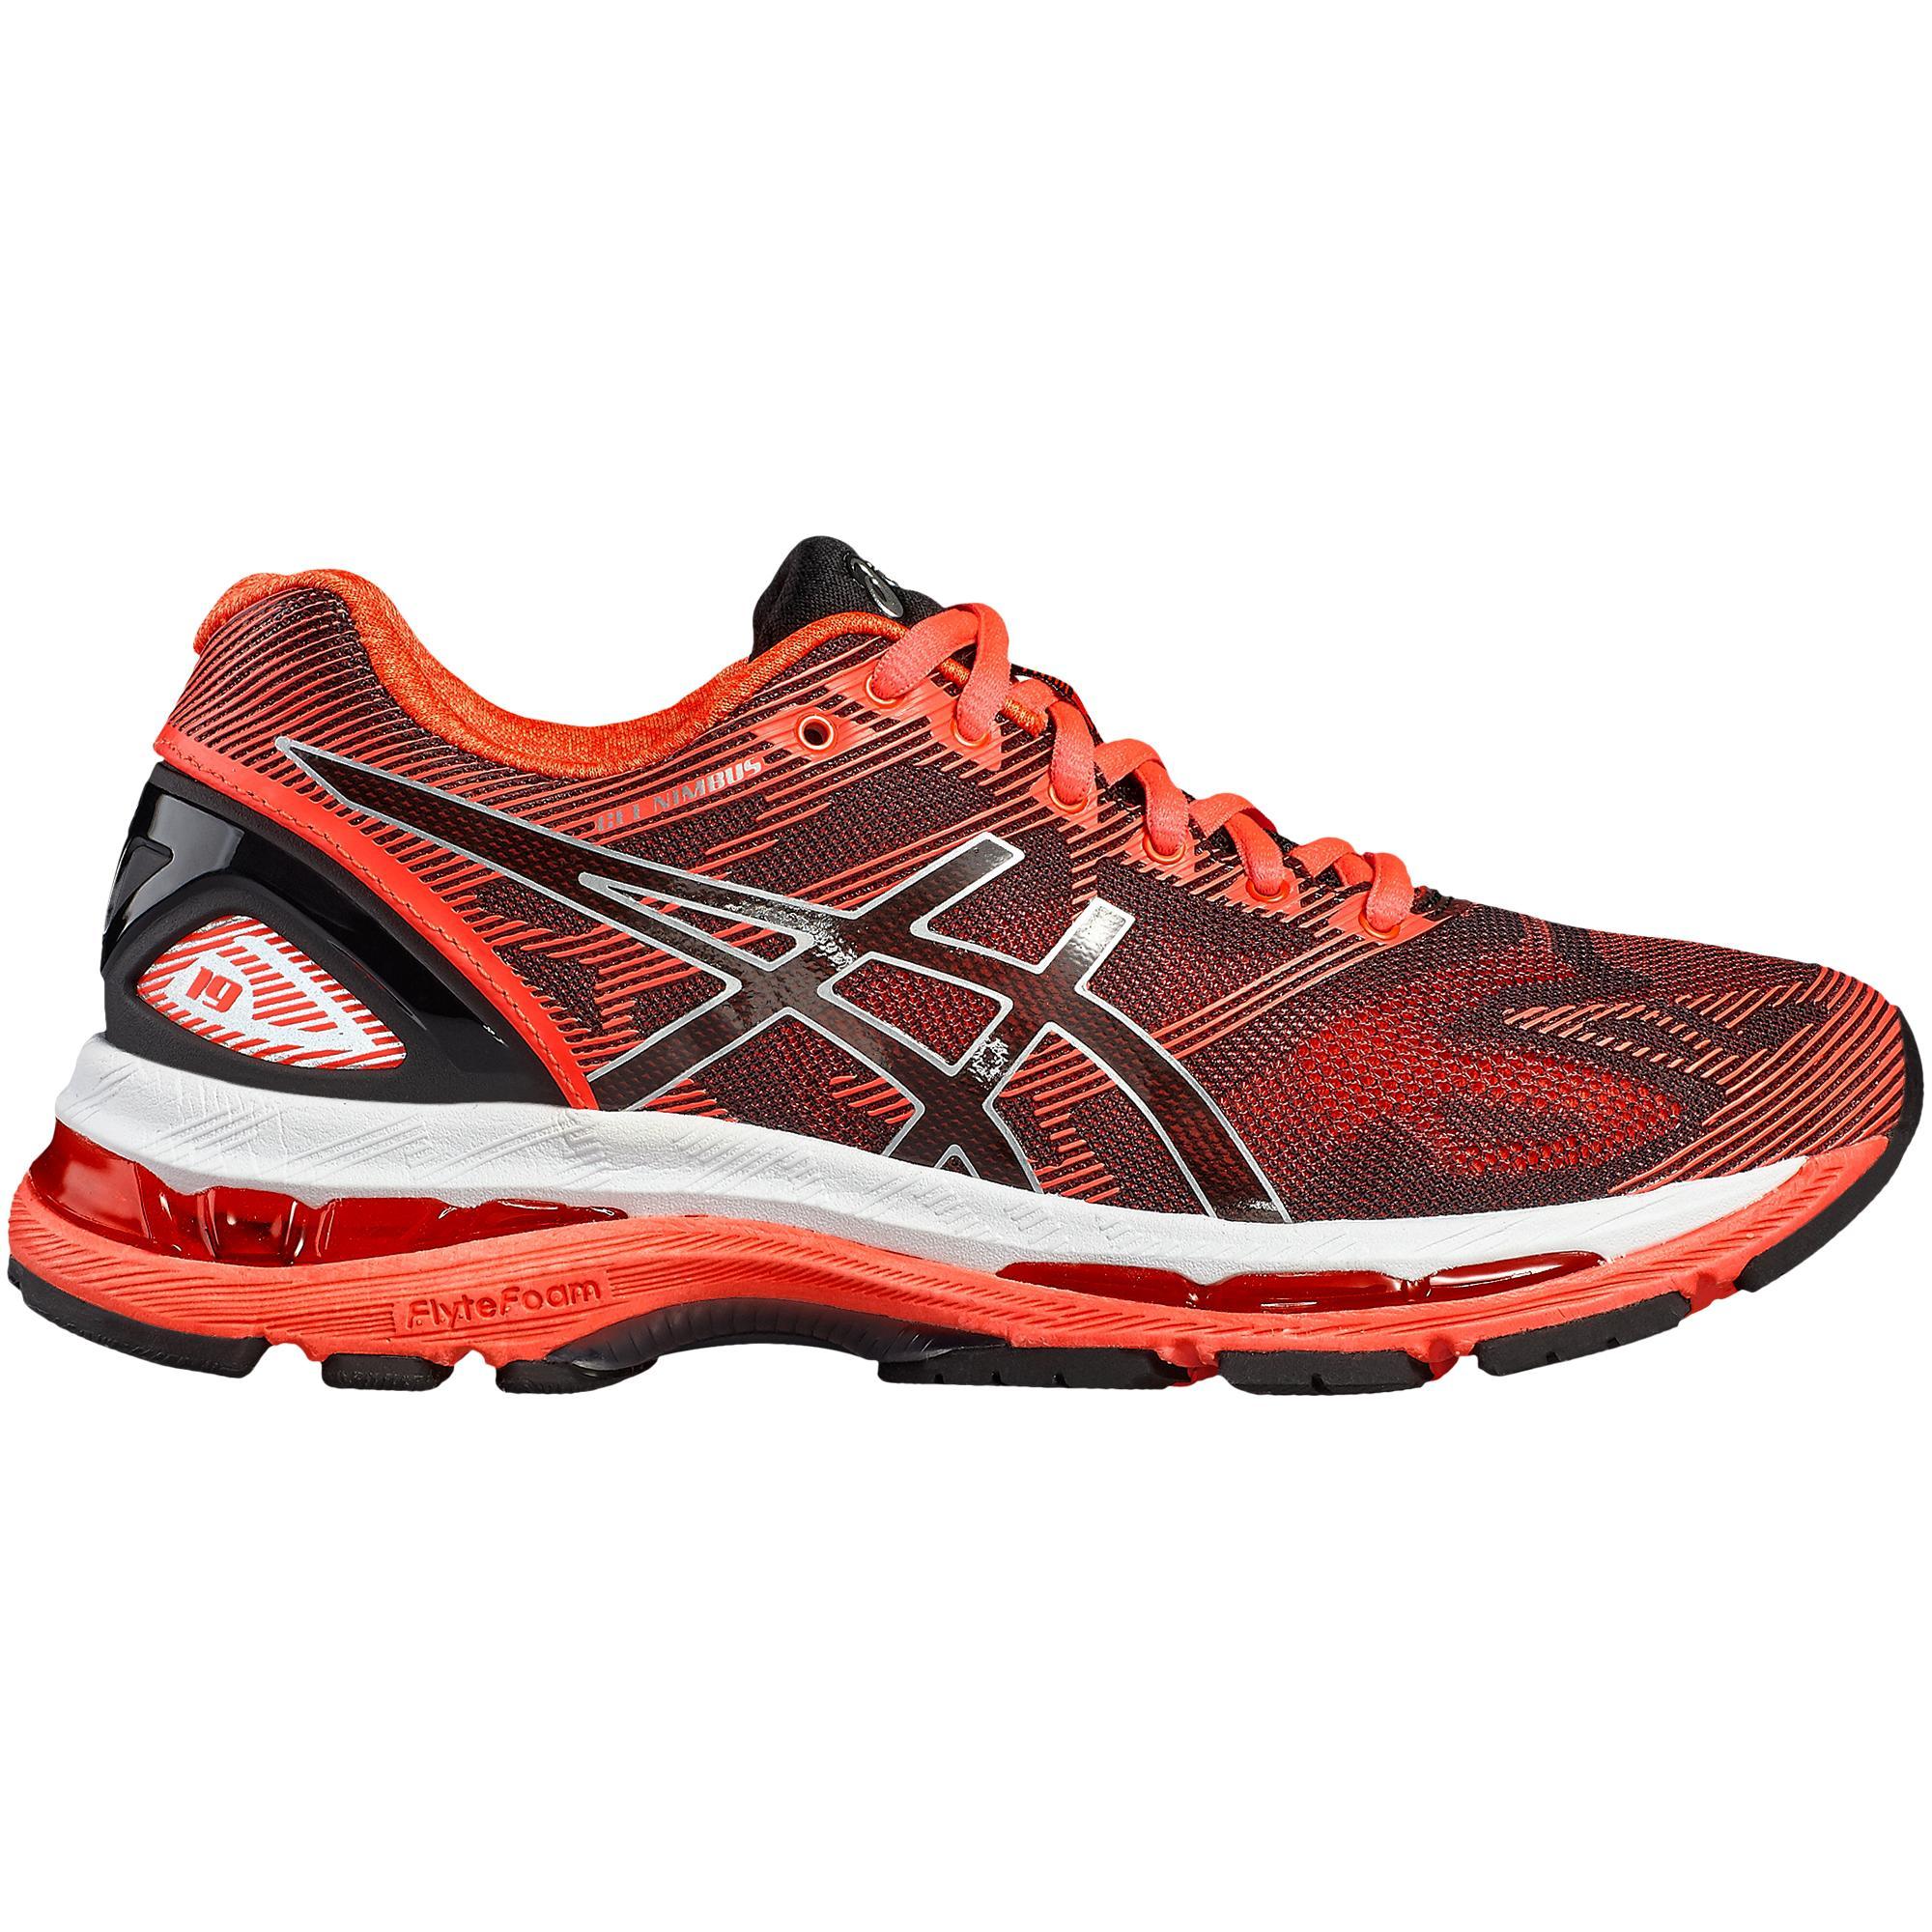 0c6bc9a5c90a Asics Womens GEL-Nimbus 19 Running Shoes - Diva Pink - Tennisnuts.com